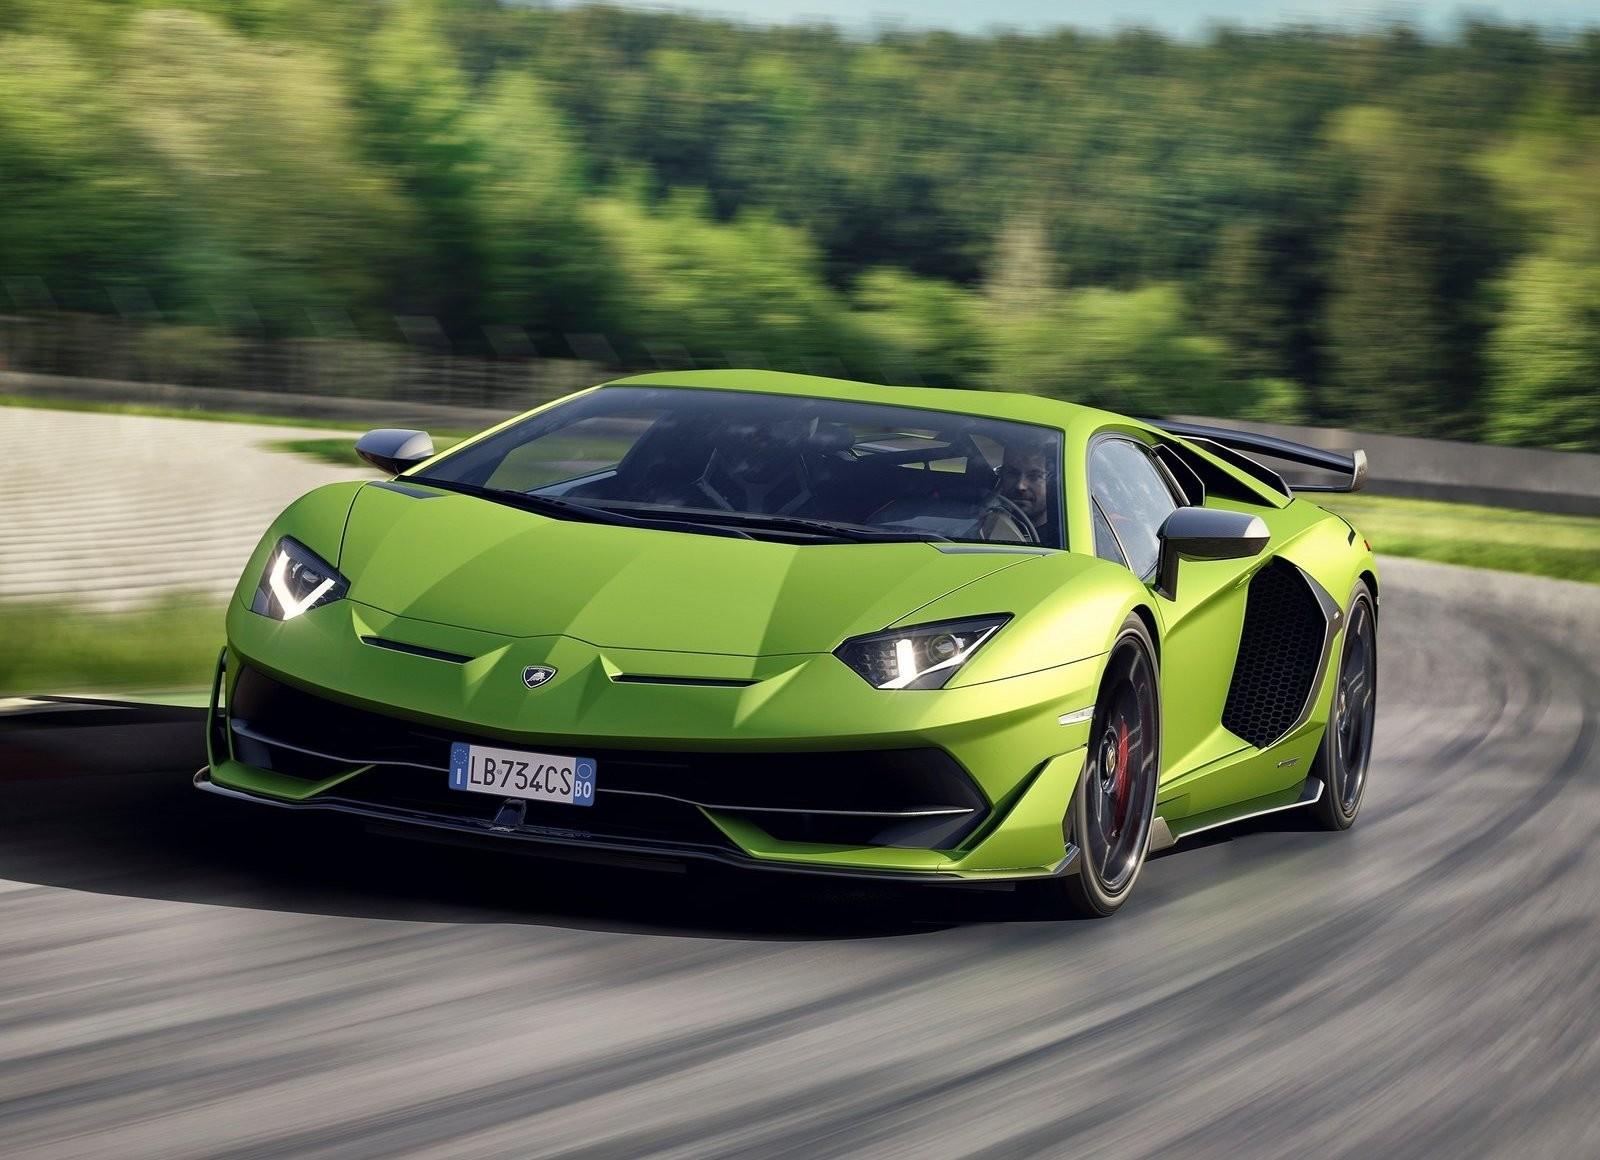 Foto de Lamborghini Aventador SVJ (8/23)